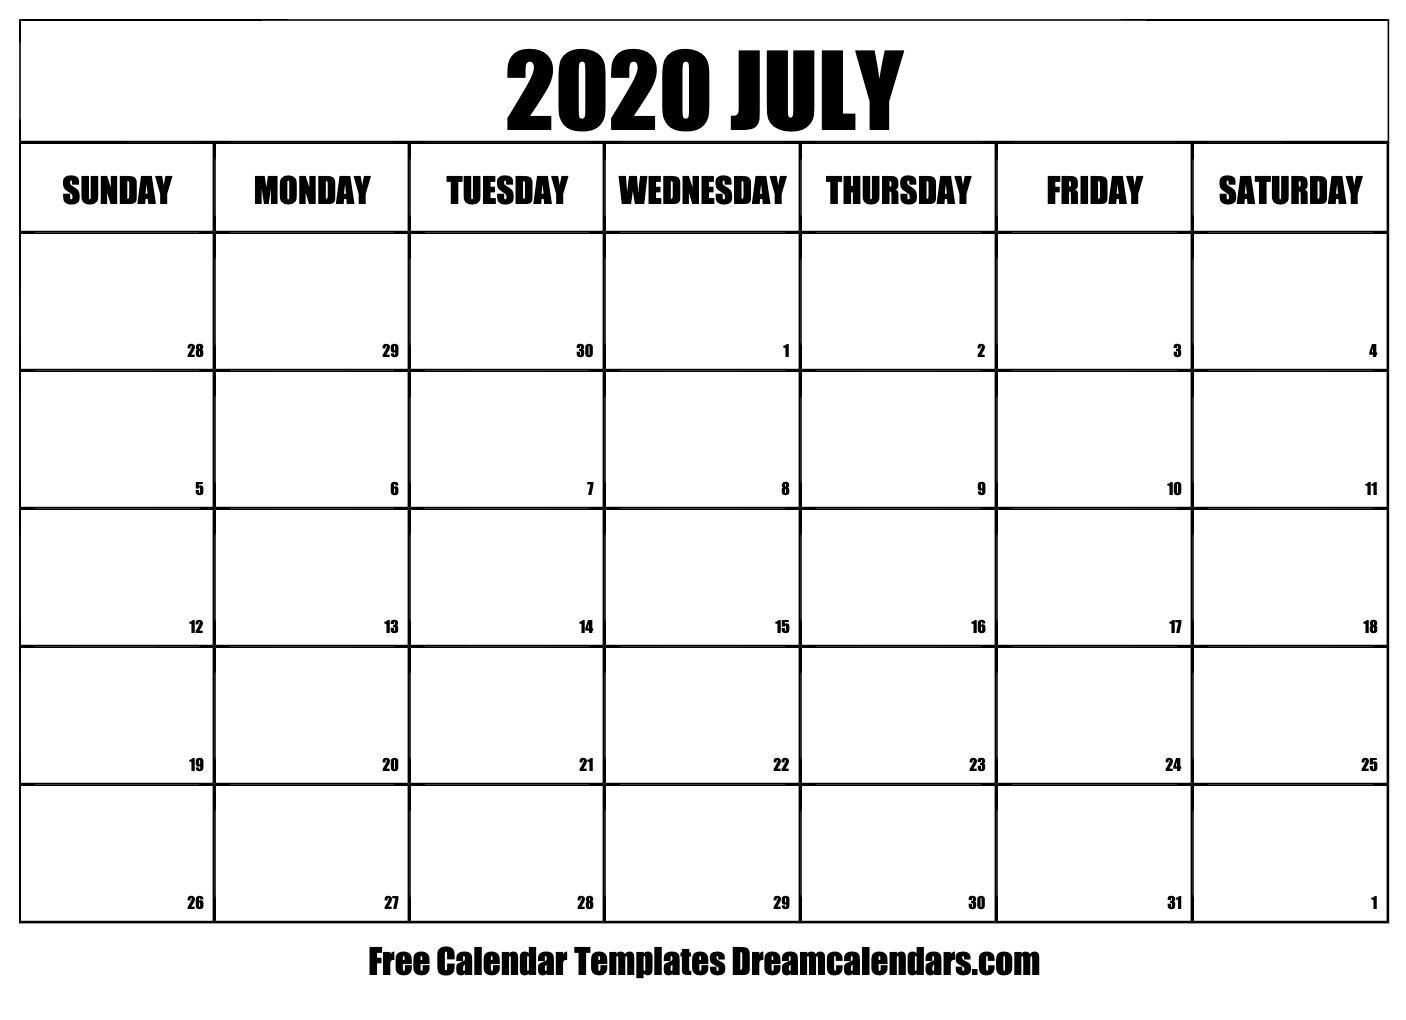 Free Printable July 2020 Calendar In 2020 | July Calendar within Printable Calendar Large Box 2020